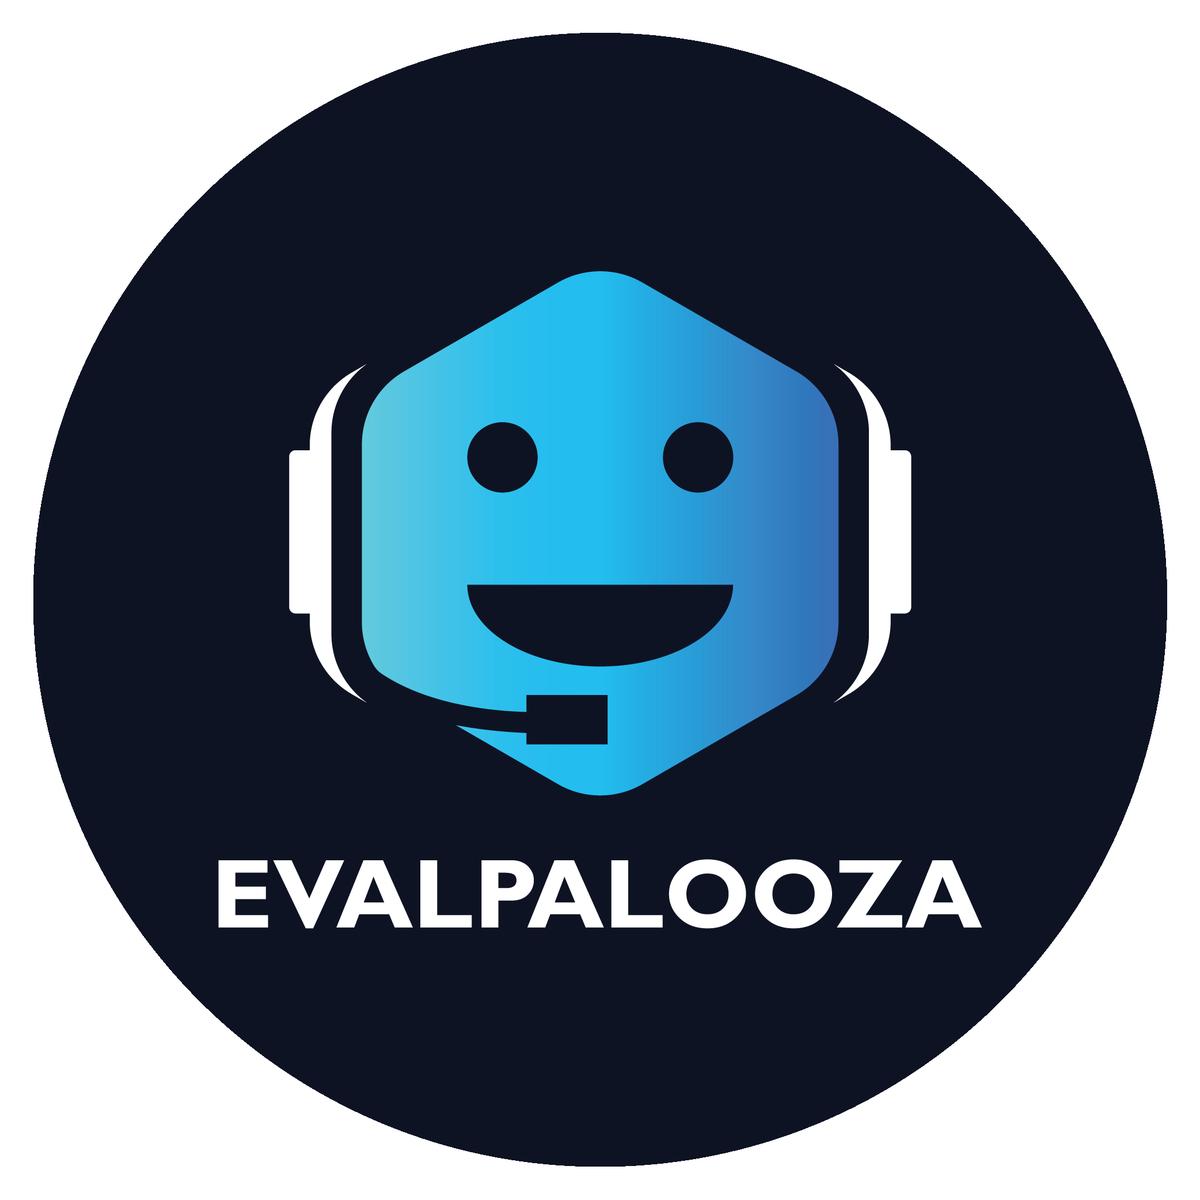 EVALpalooza logo